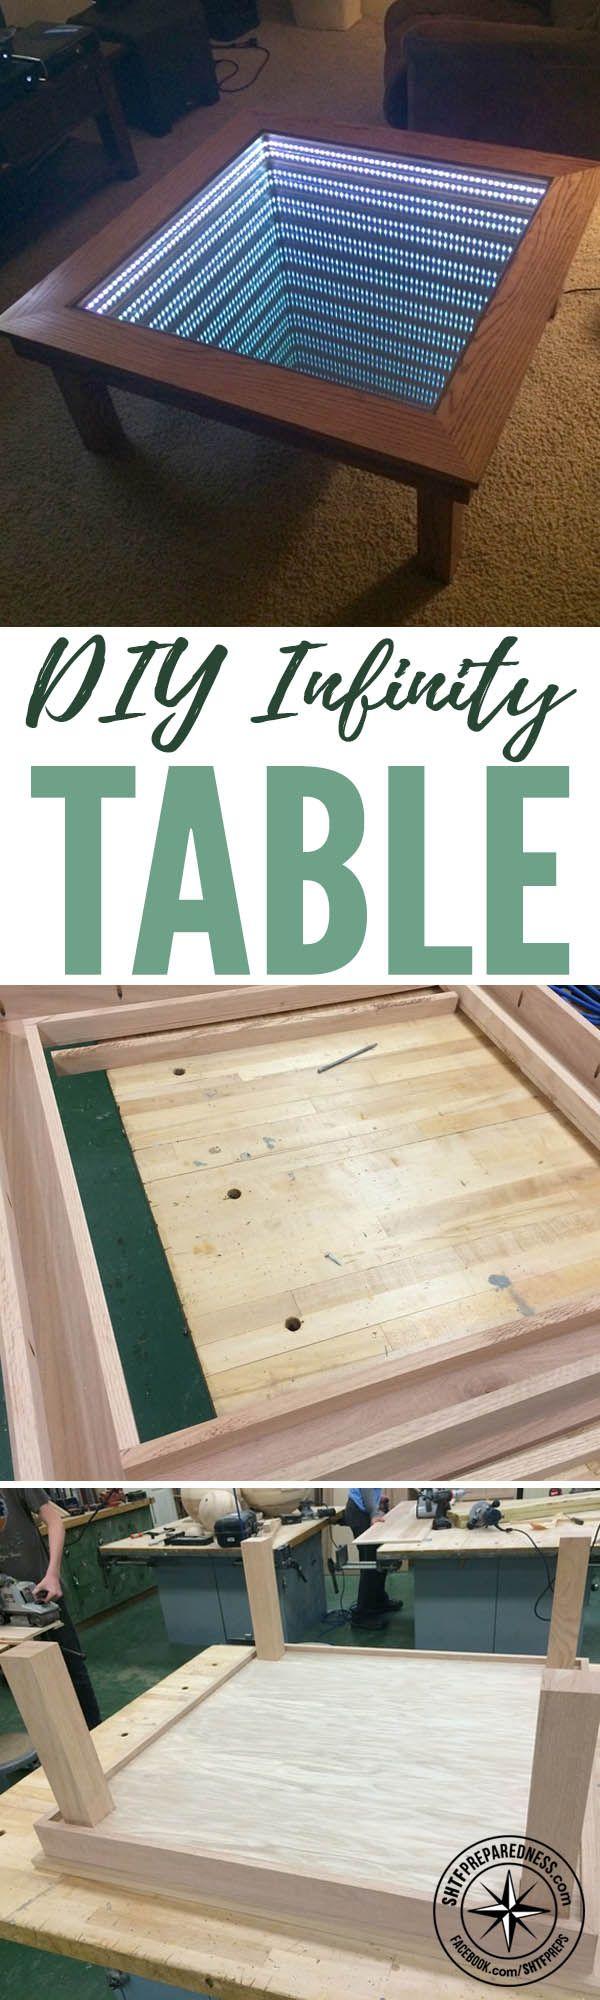 DIY Infinity Table u2014 DIY woodworking projects